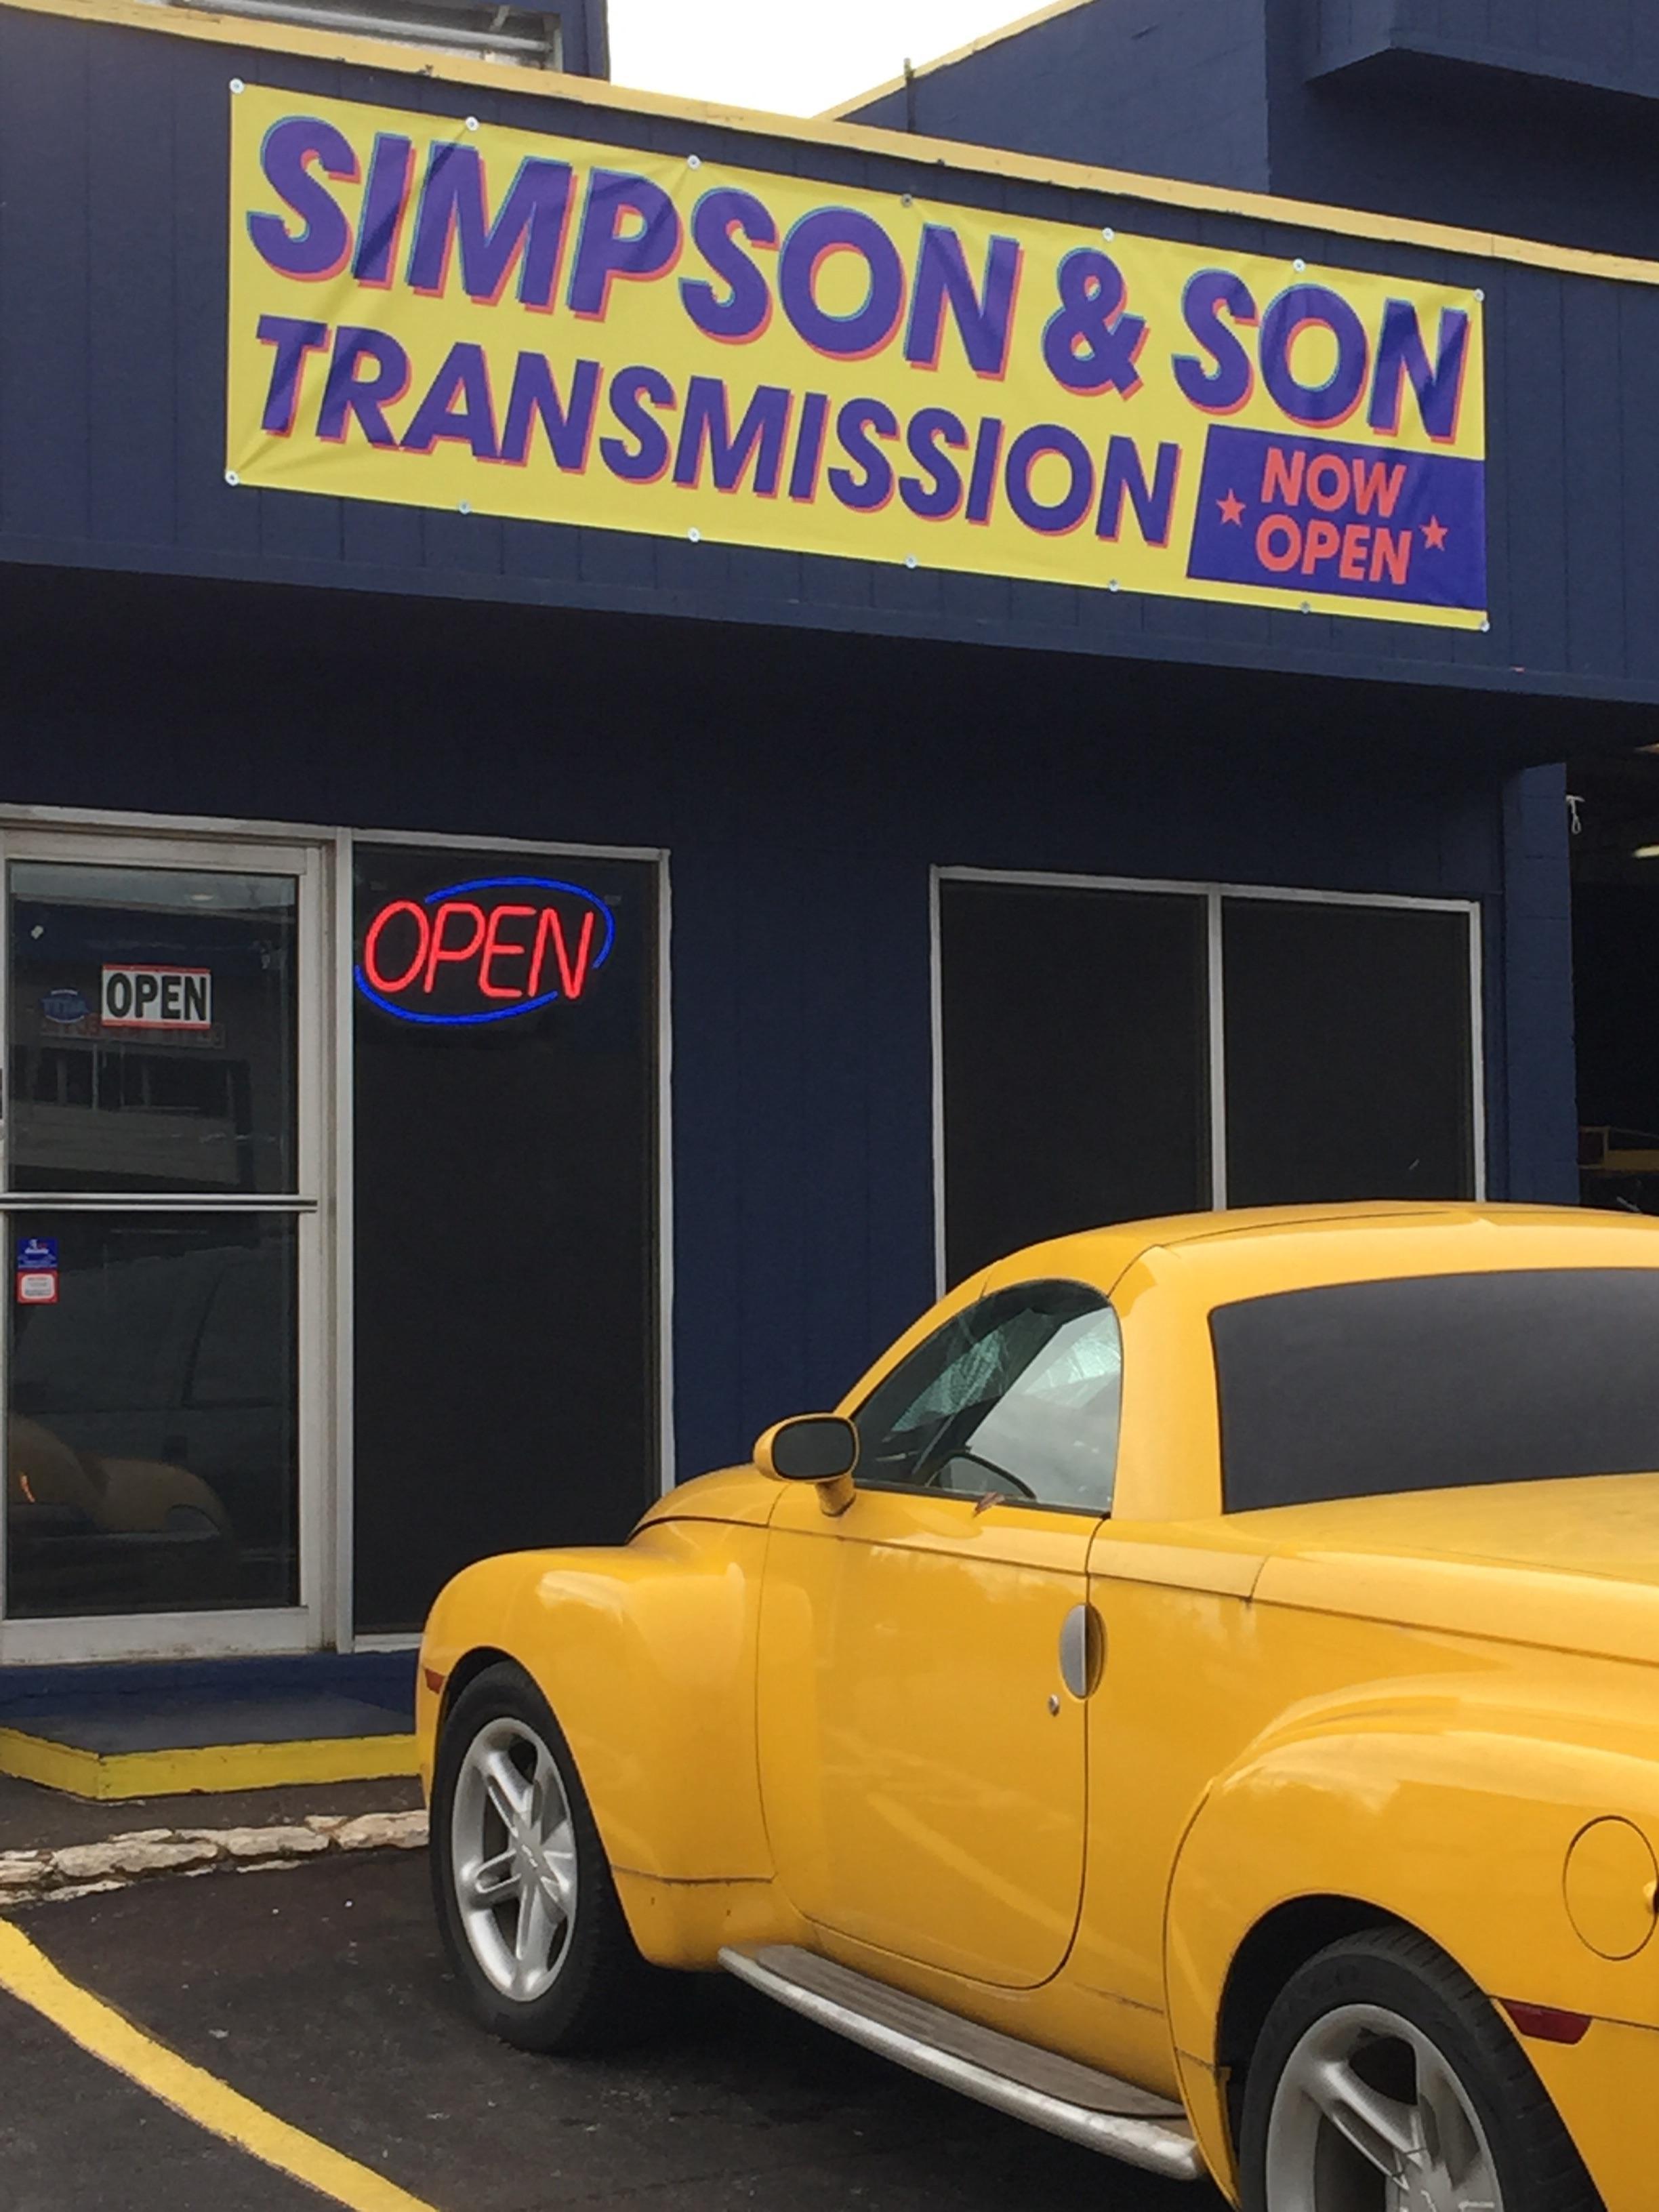 Simpson & Son Transmission